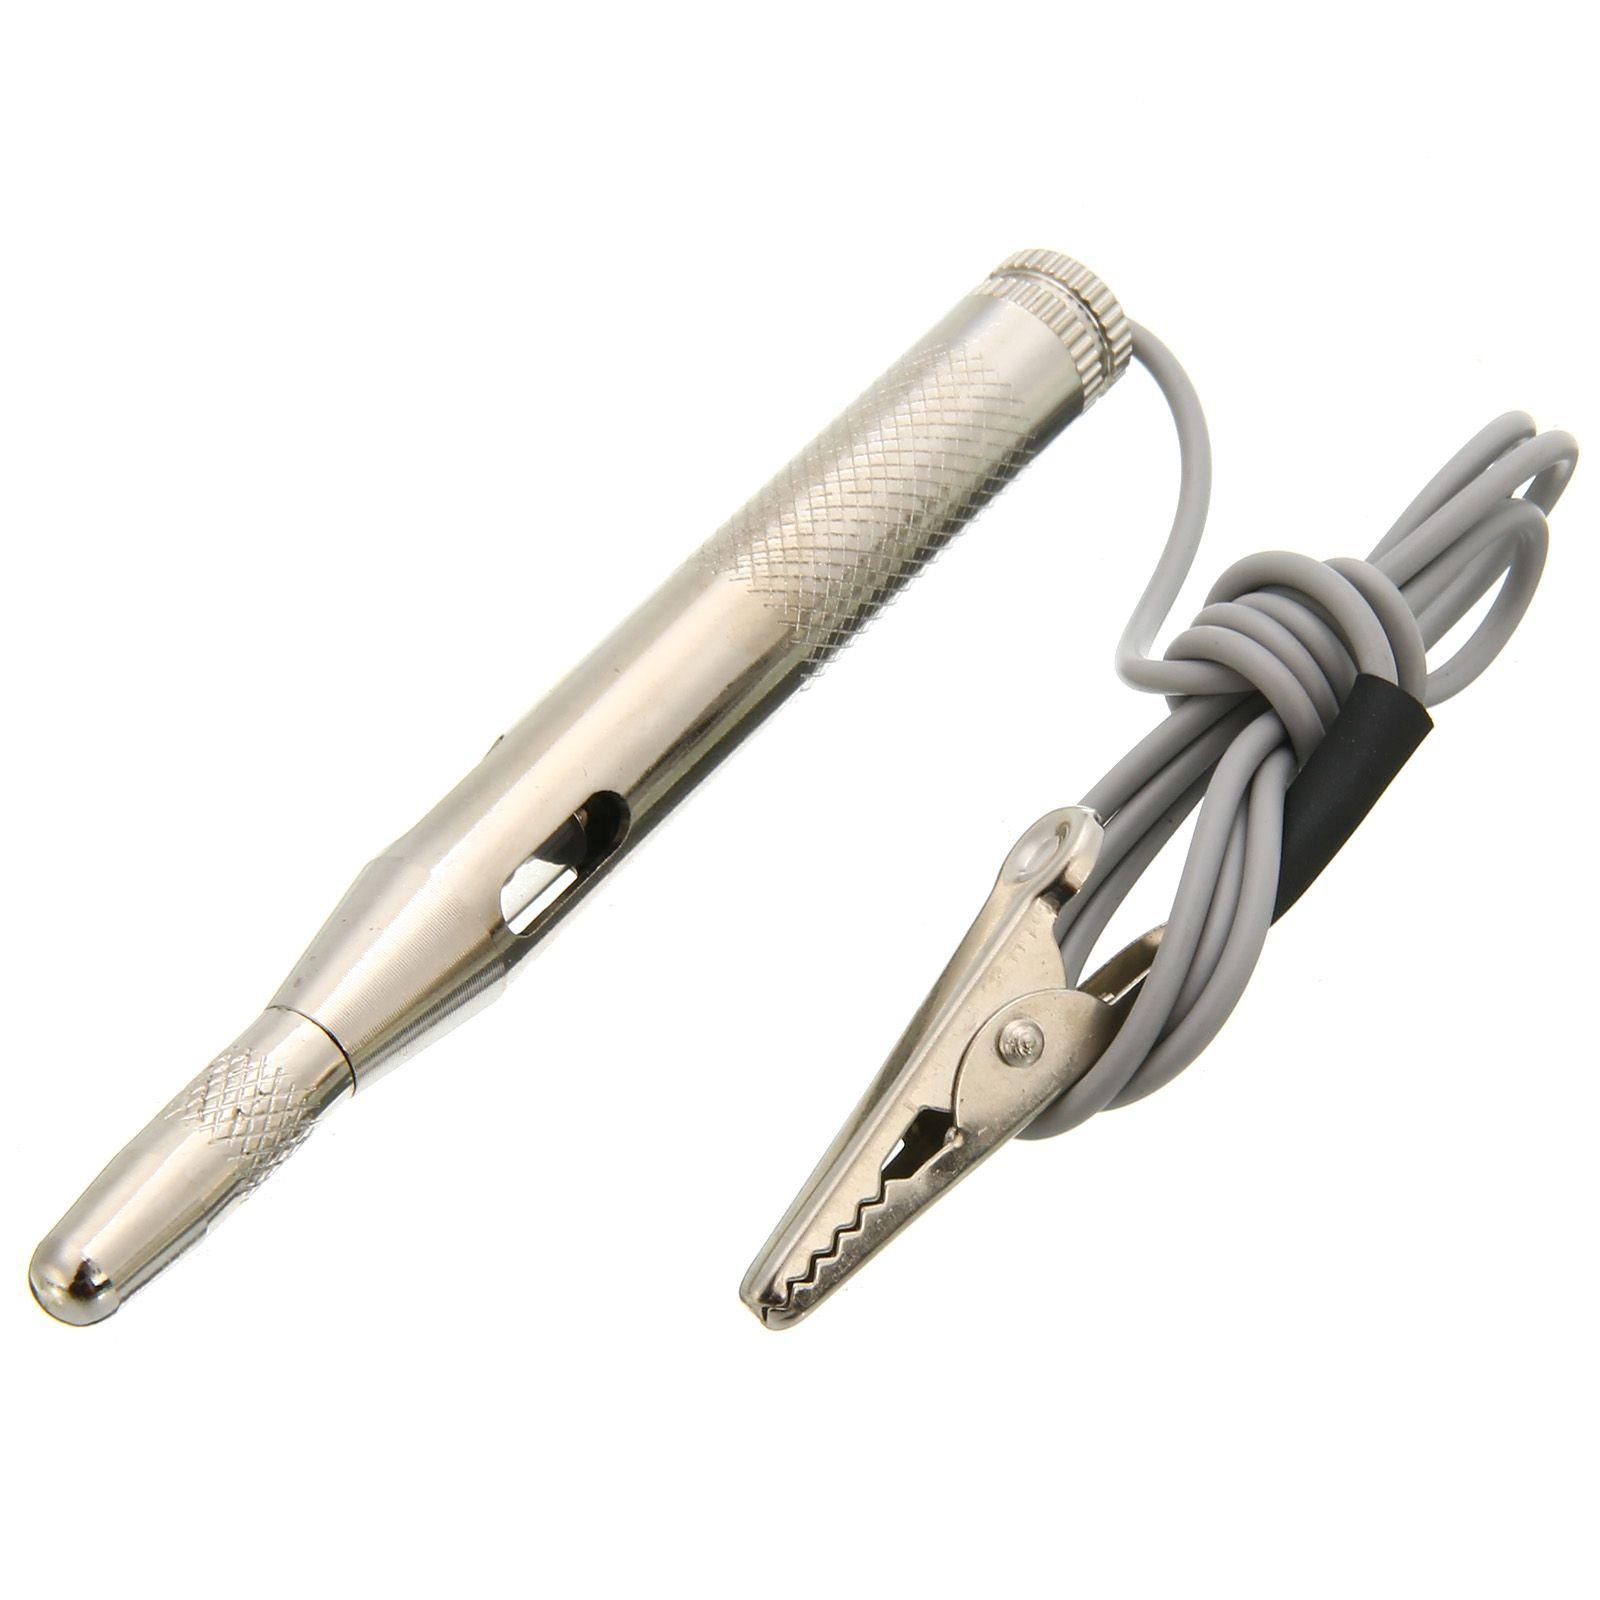 New DC 6V 12V 24V Probe Light System Test Probe Lamp Auto Car Light Circuit Tester Lamp Voltage Test Pen Detector Copper